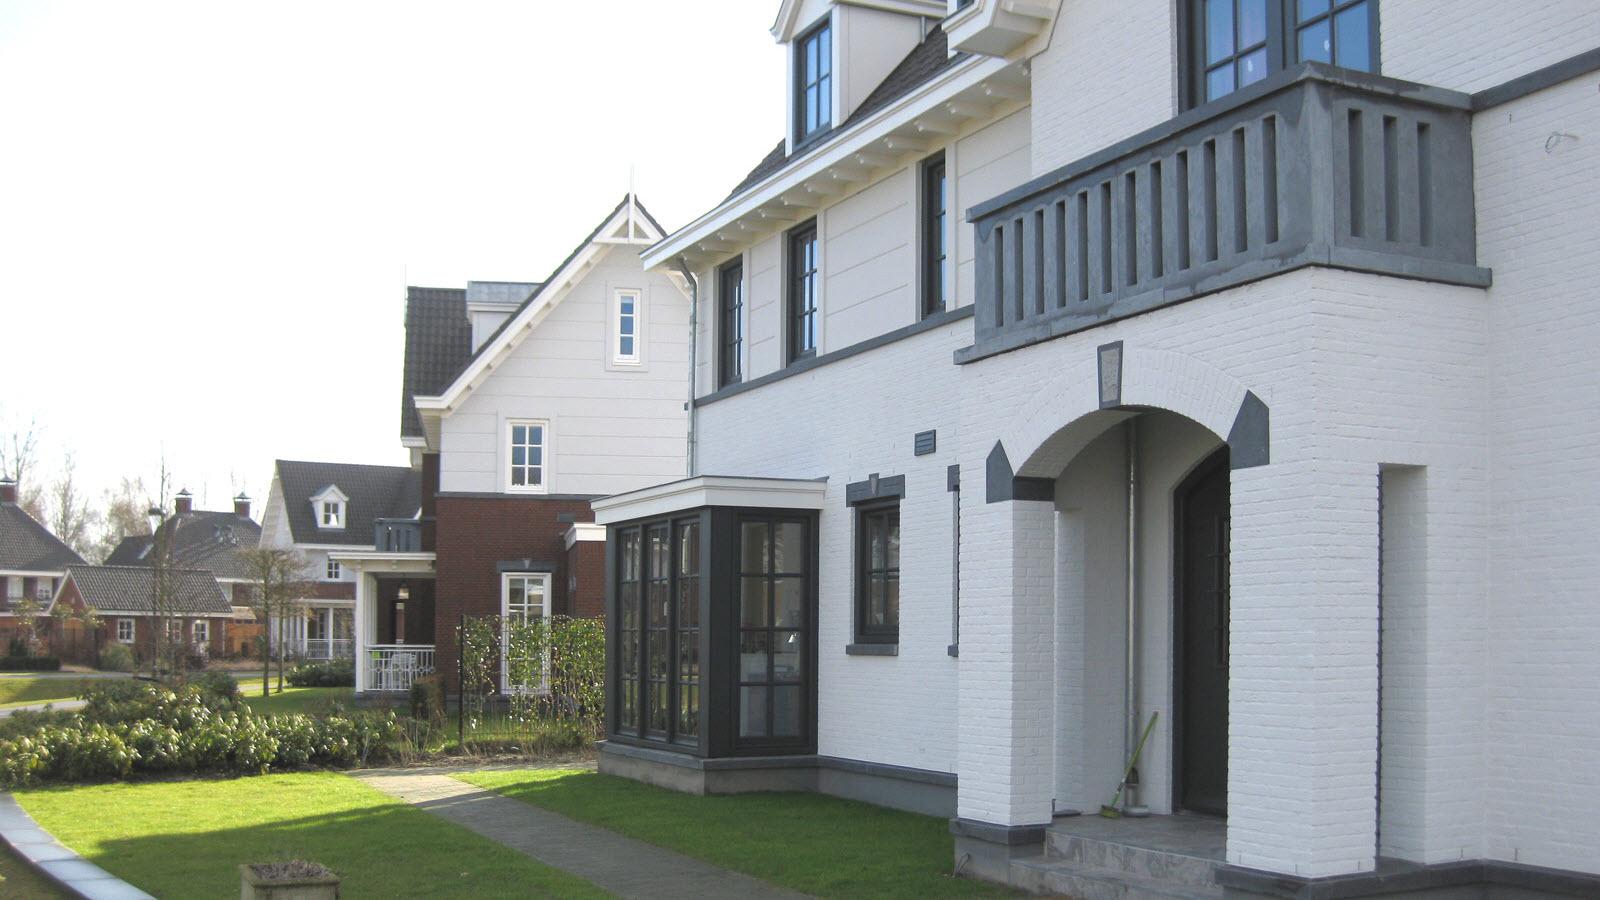 Parkhagen Sint Michielsgestel (2)